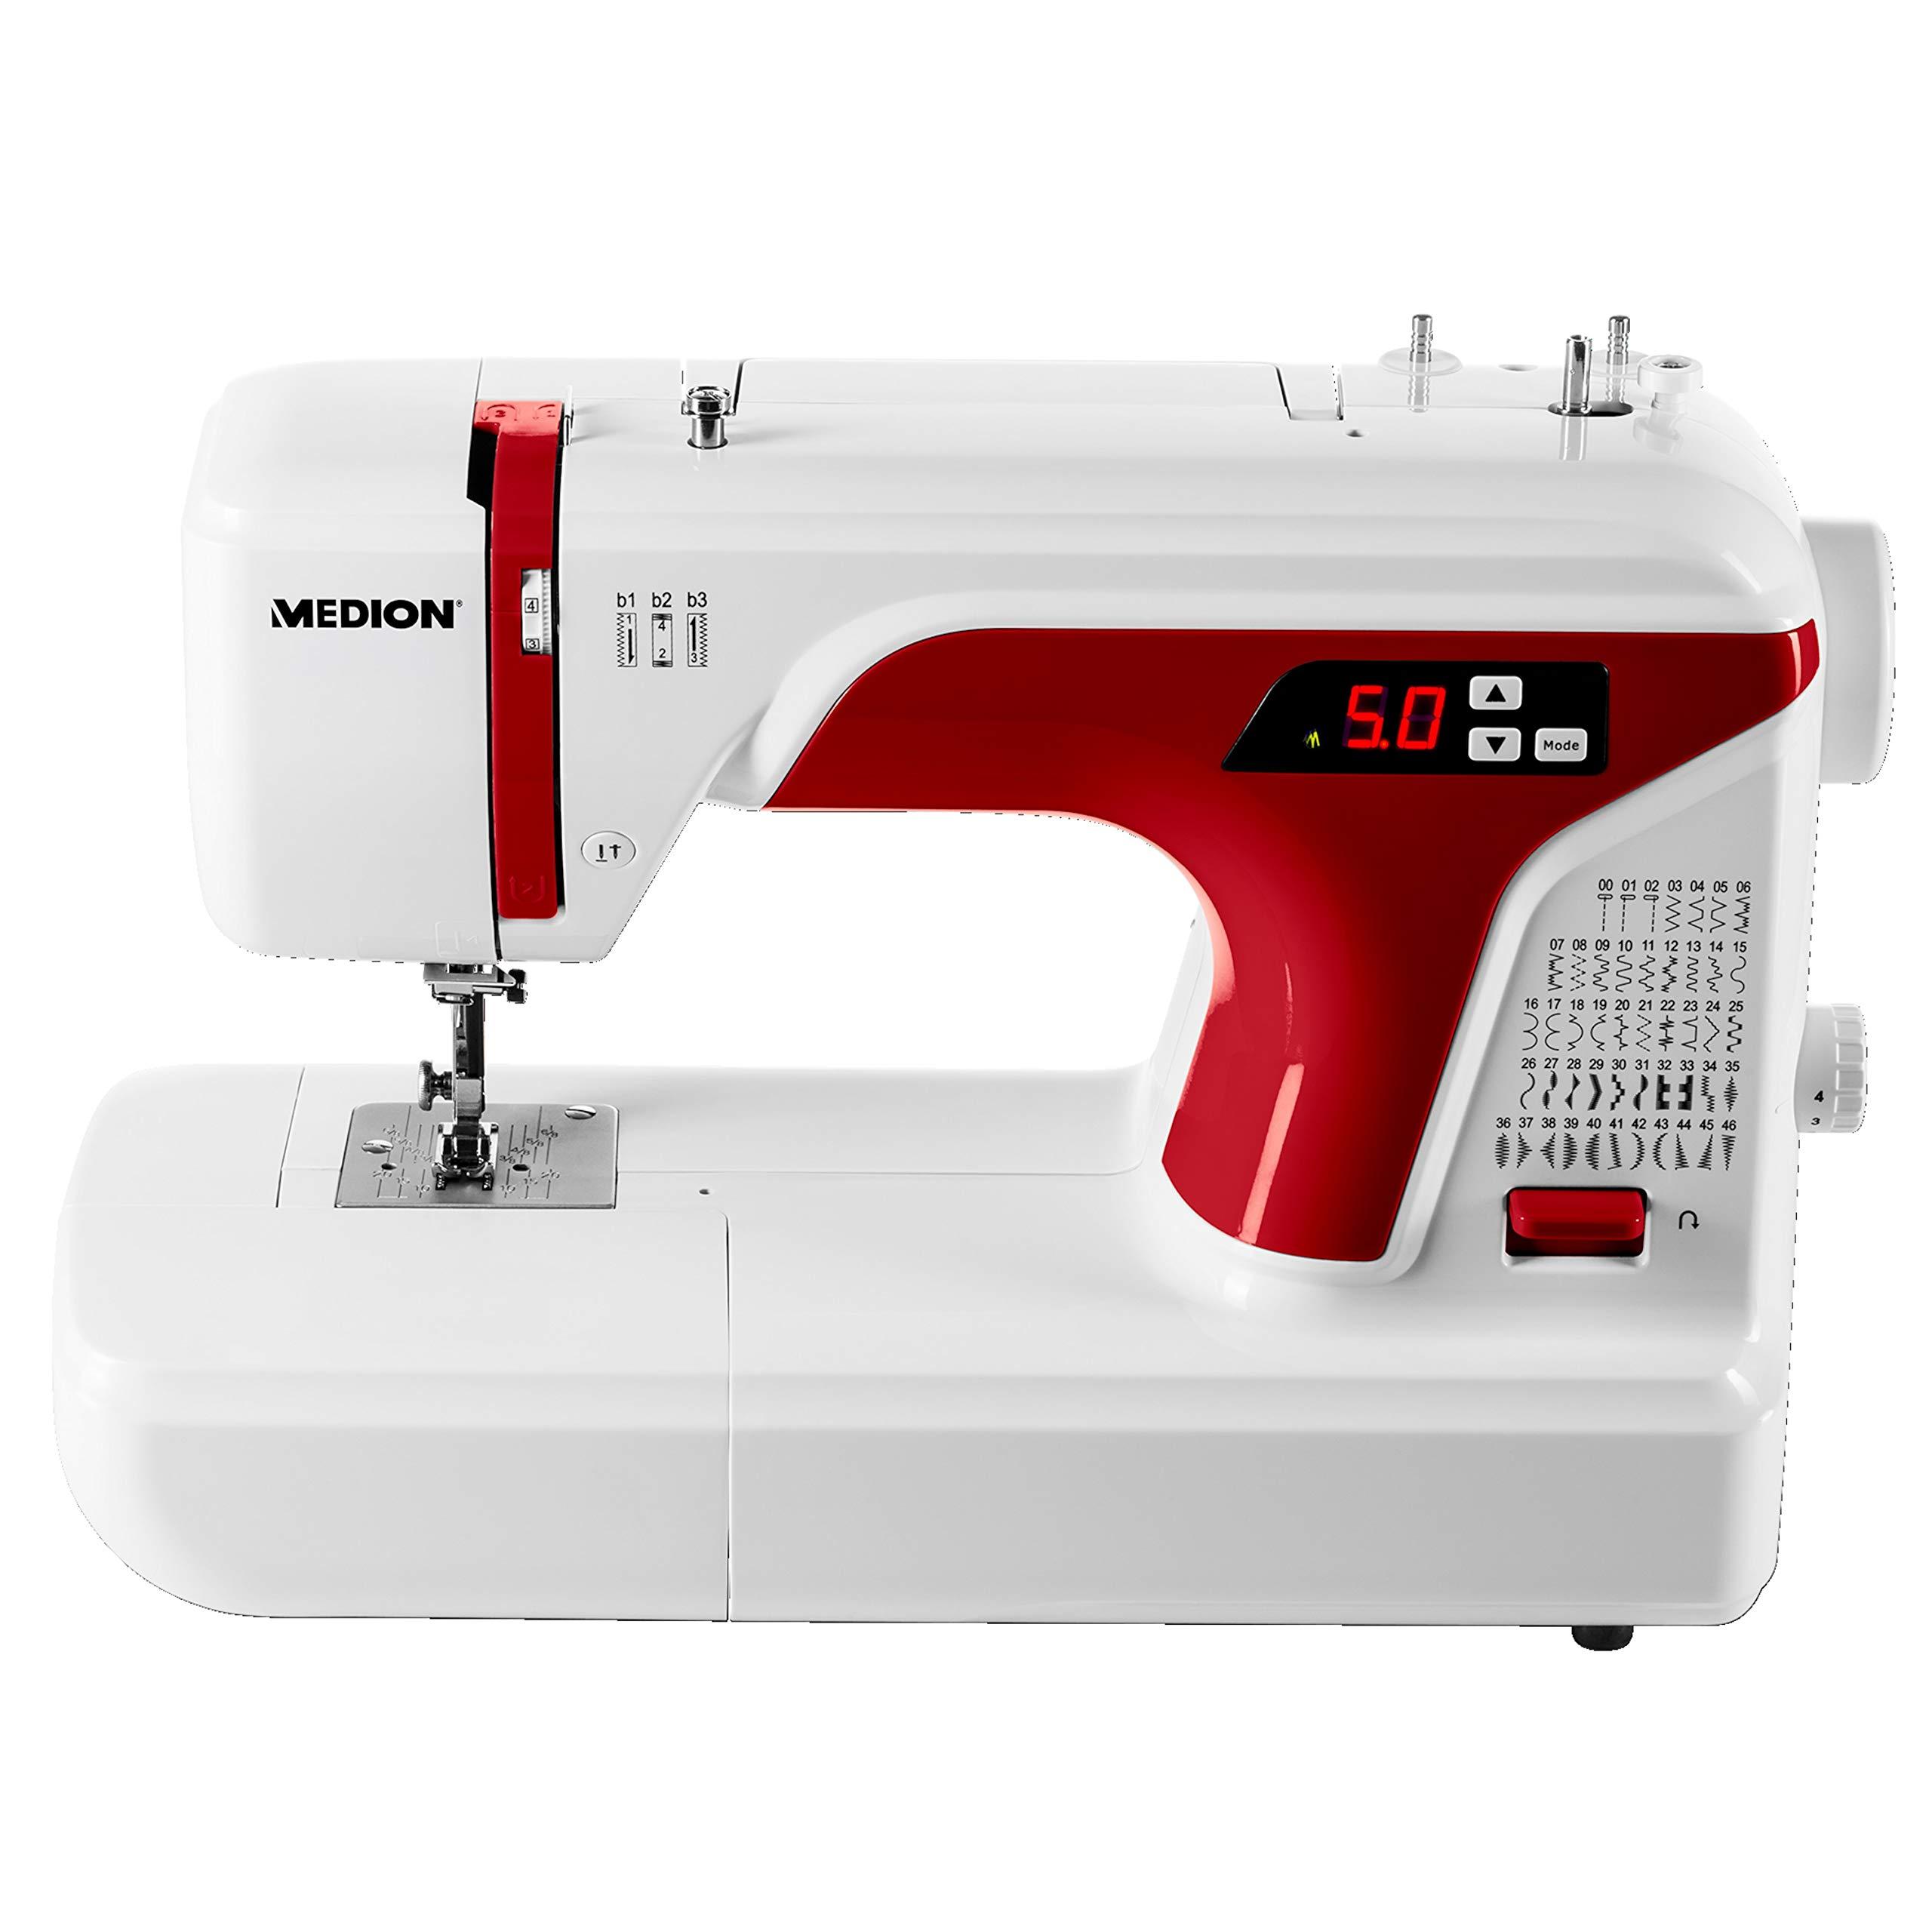 MEDION MD 16661 - Máquina de coser digital, ojal automático, 40 ...